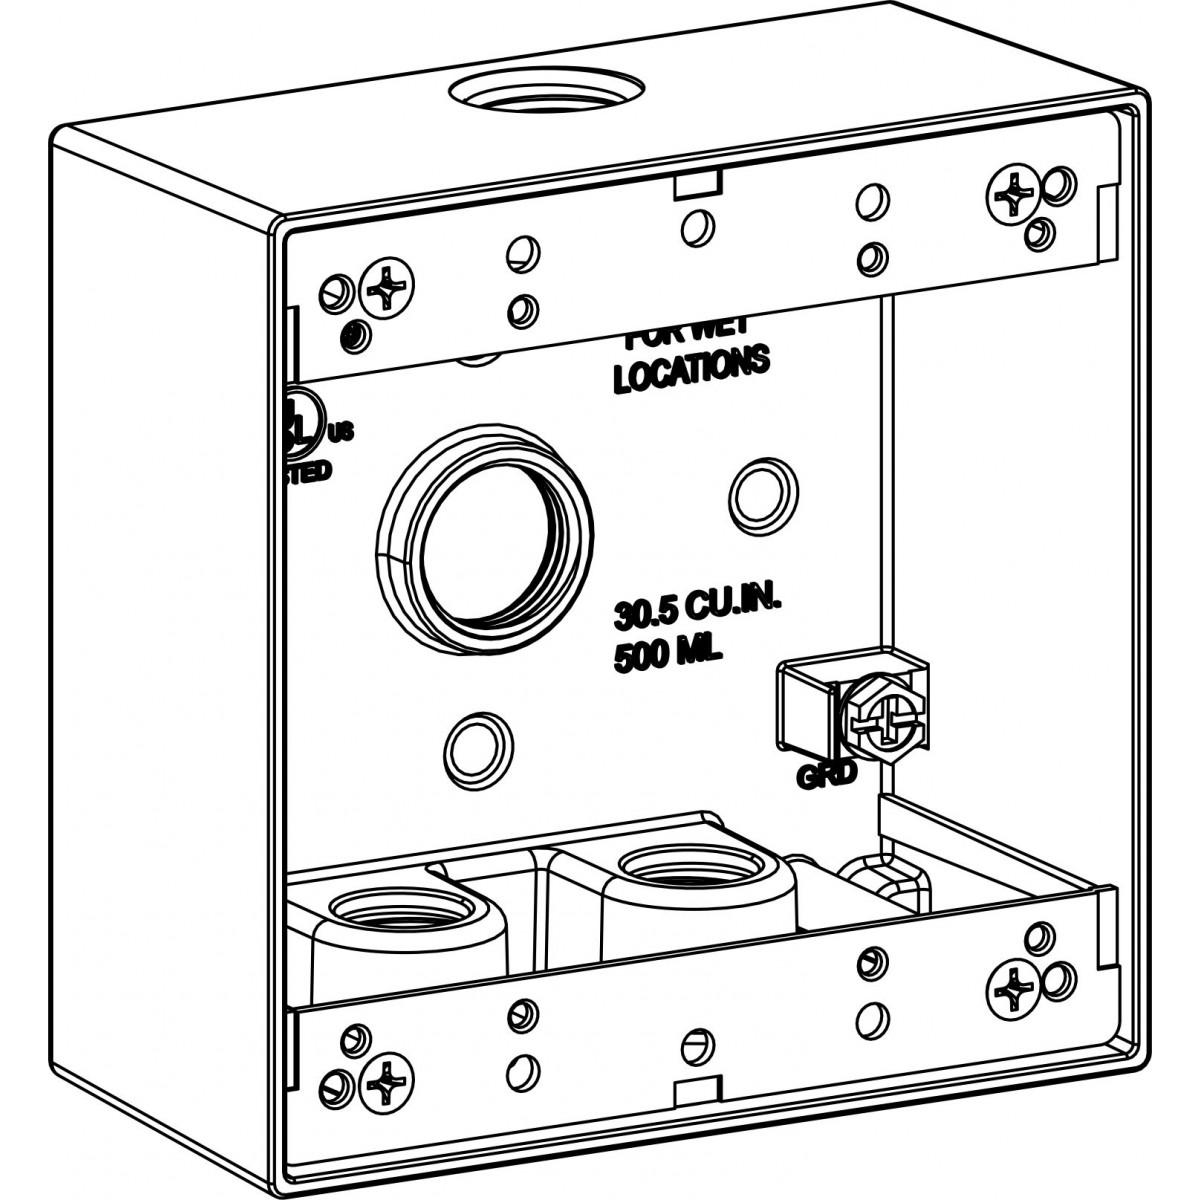 2 Gang Electrical Box Drawing